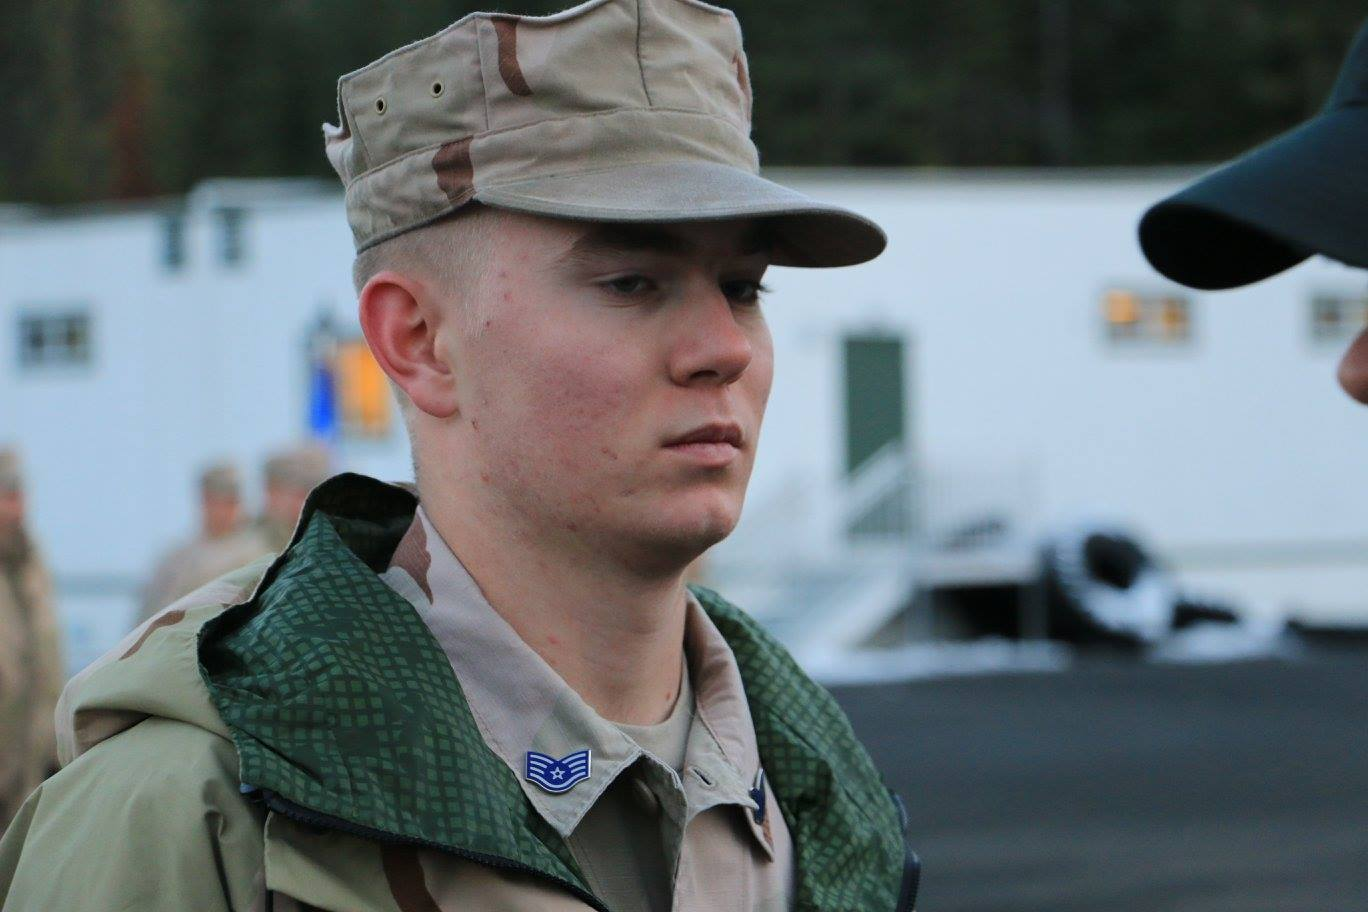 Cadet Smith Success